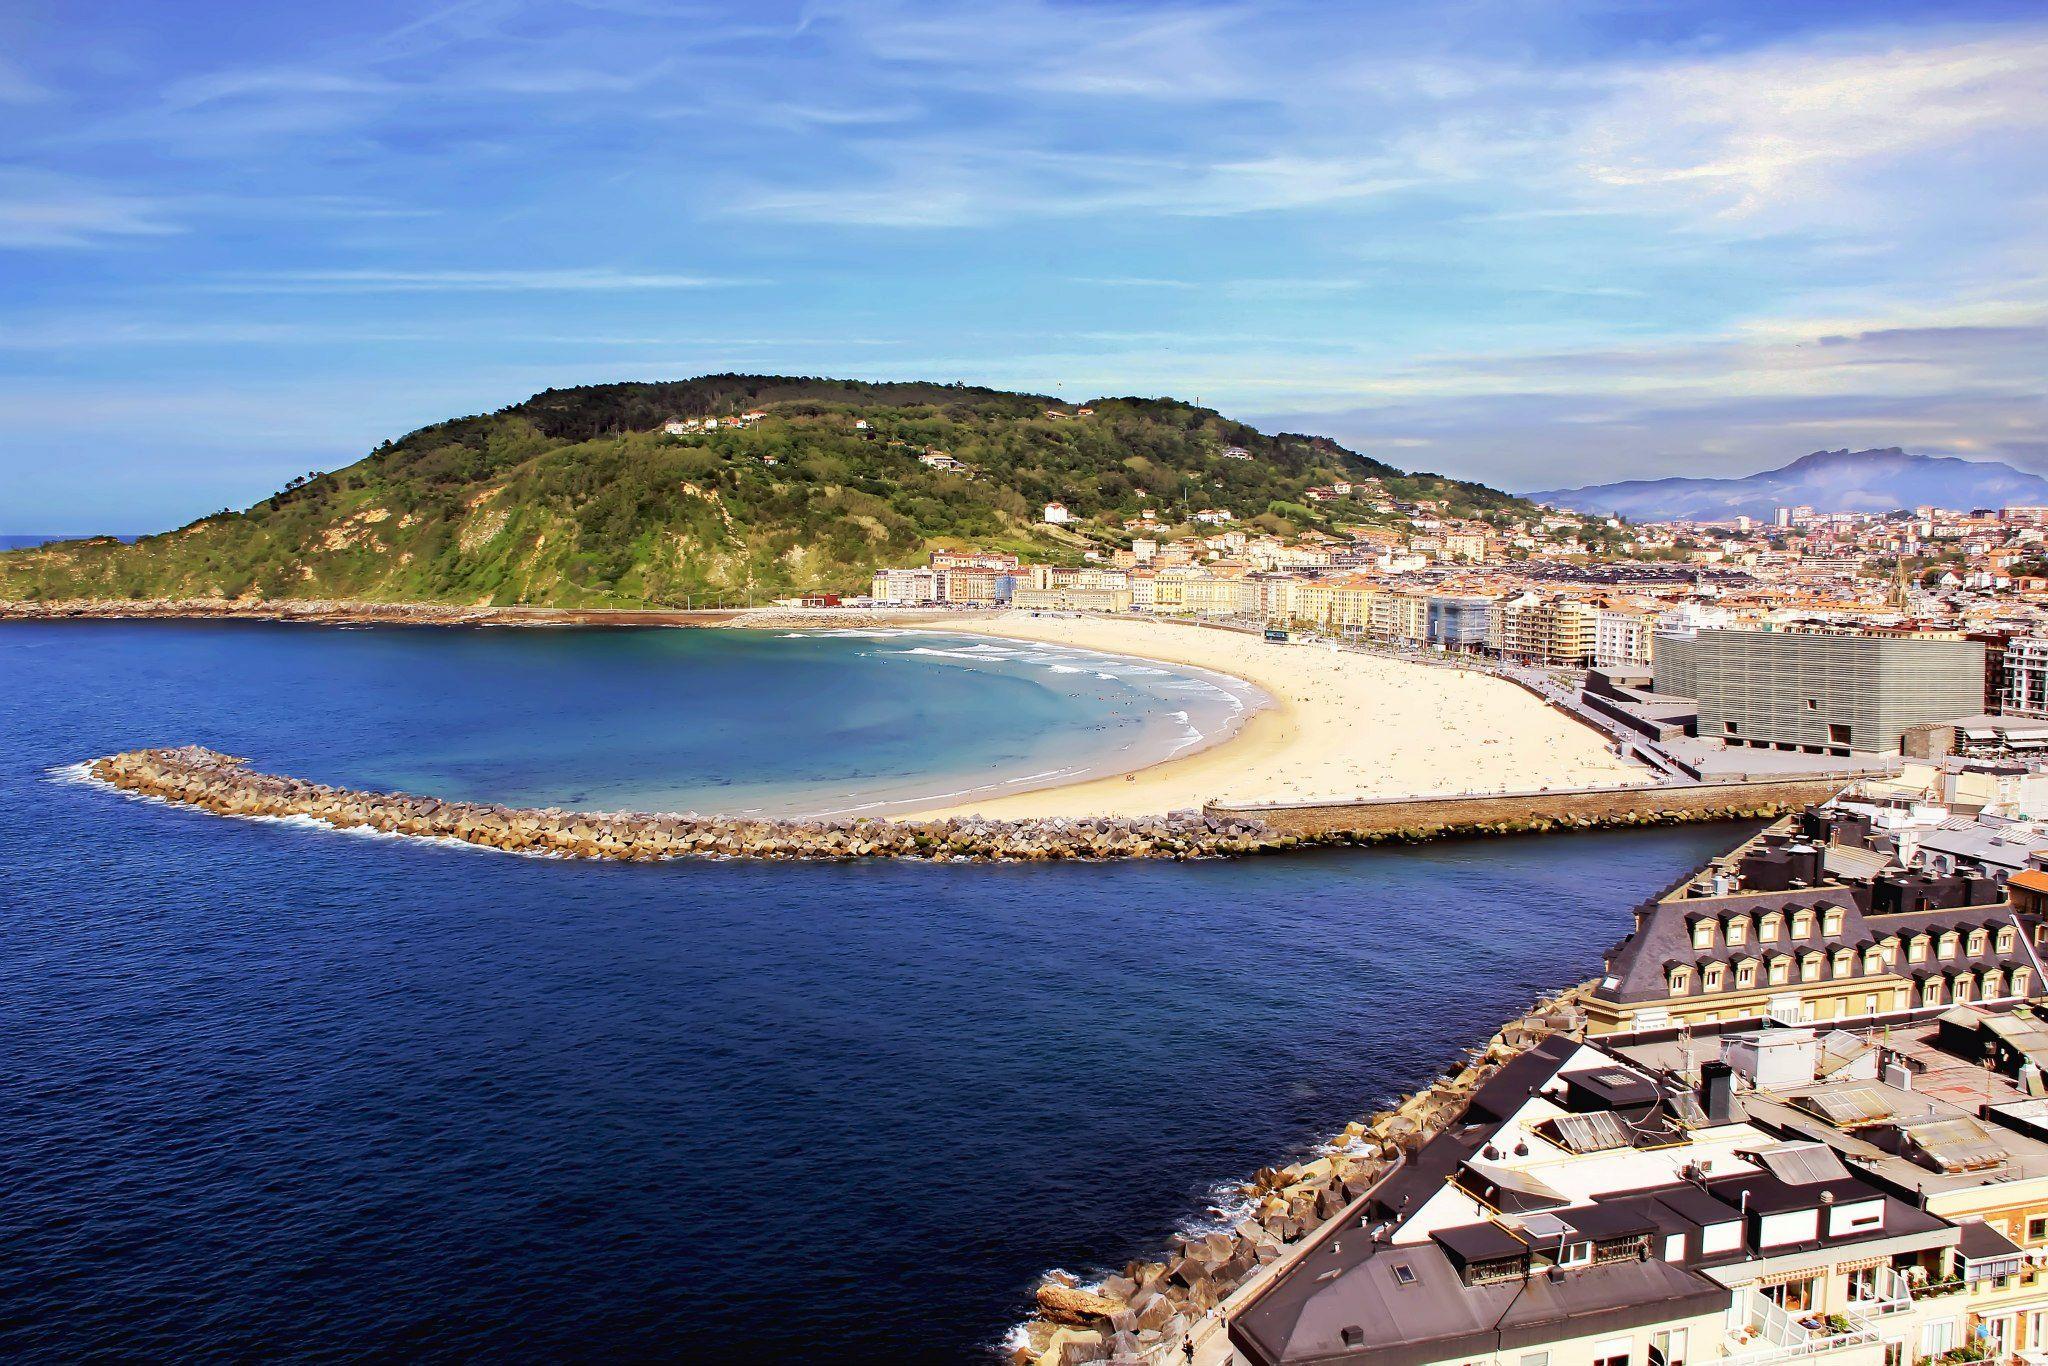 Playa de la Zurriola. Donostia San Sebastián Foto de Kosty http://on.fb.me/1ln5HDe